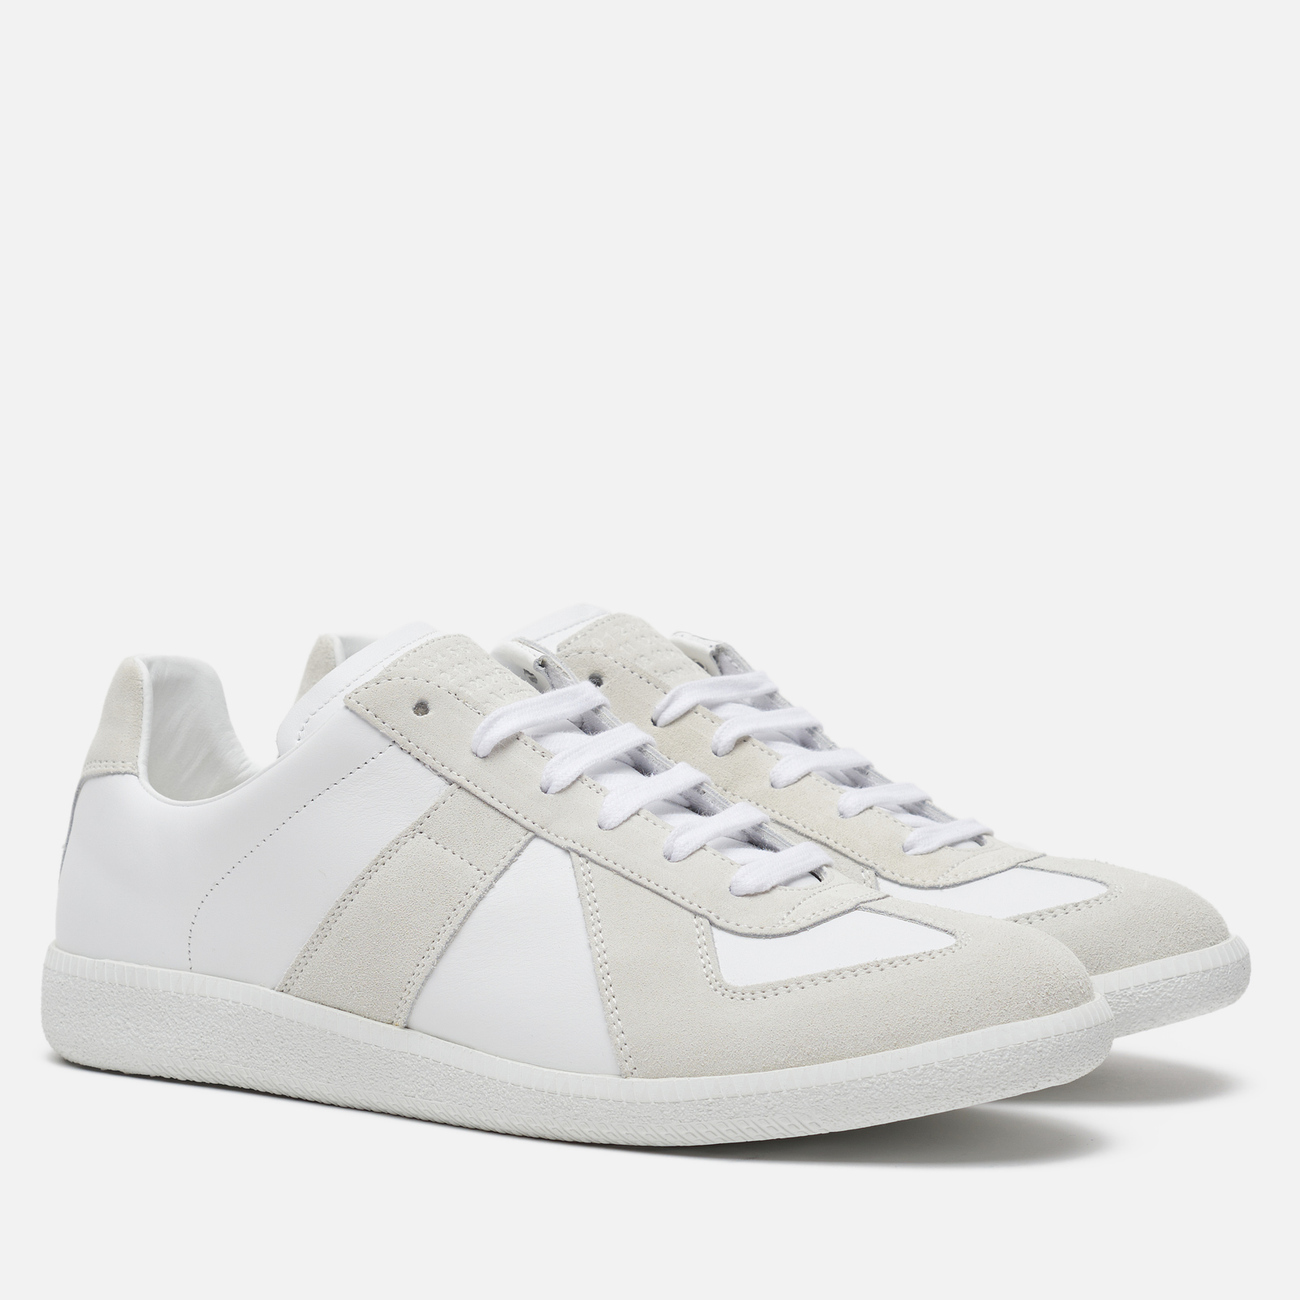 Мужские кроссовки Maison Margiela Replica Low Top Off White